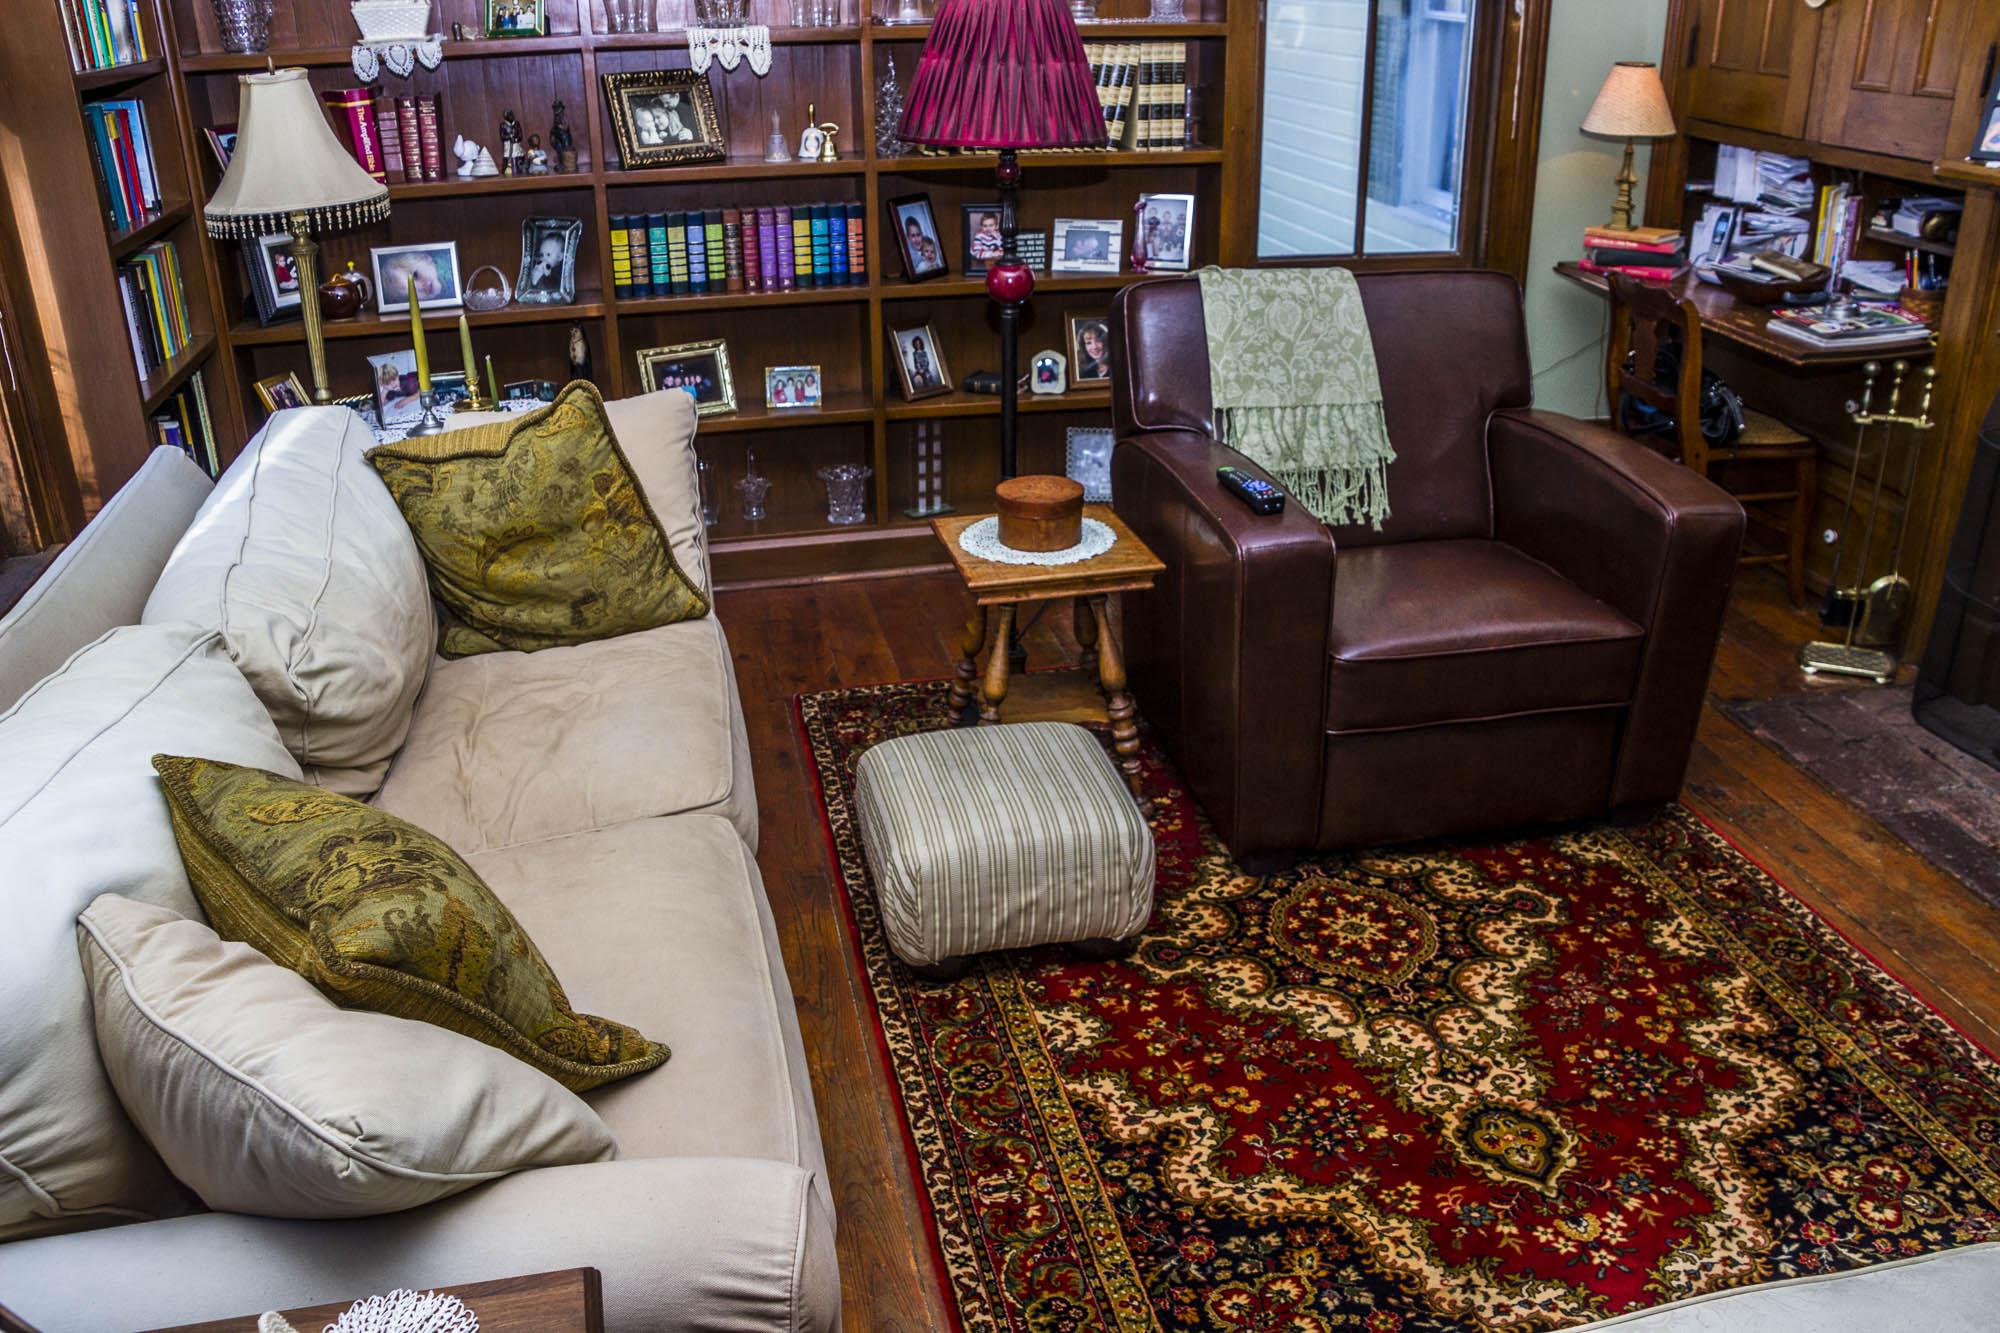 Downstairs sitting room. TV, bookshelves, lots of comfort.